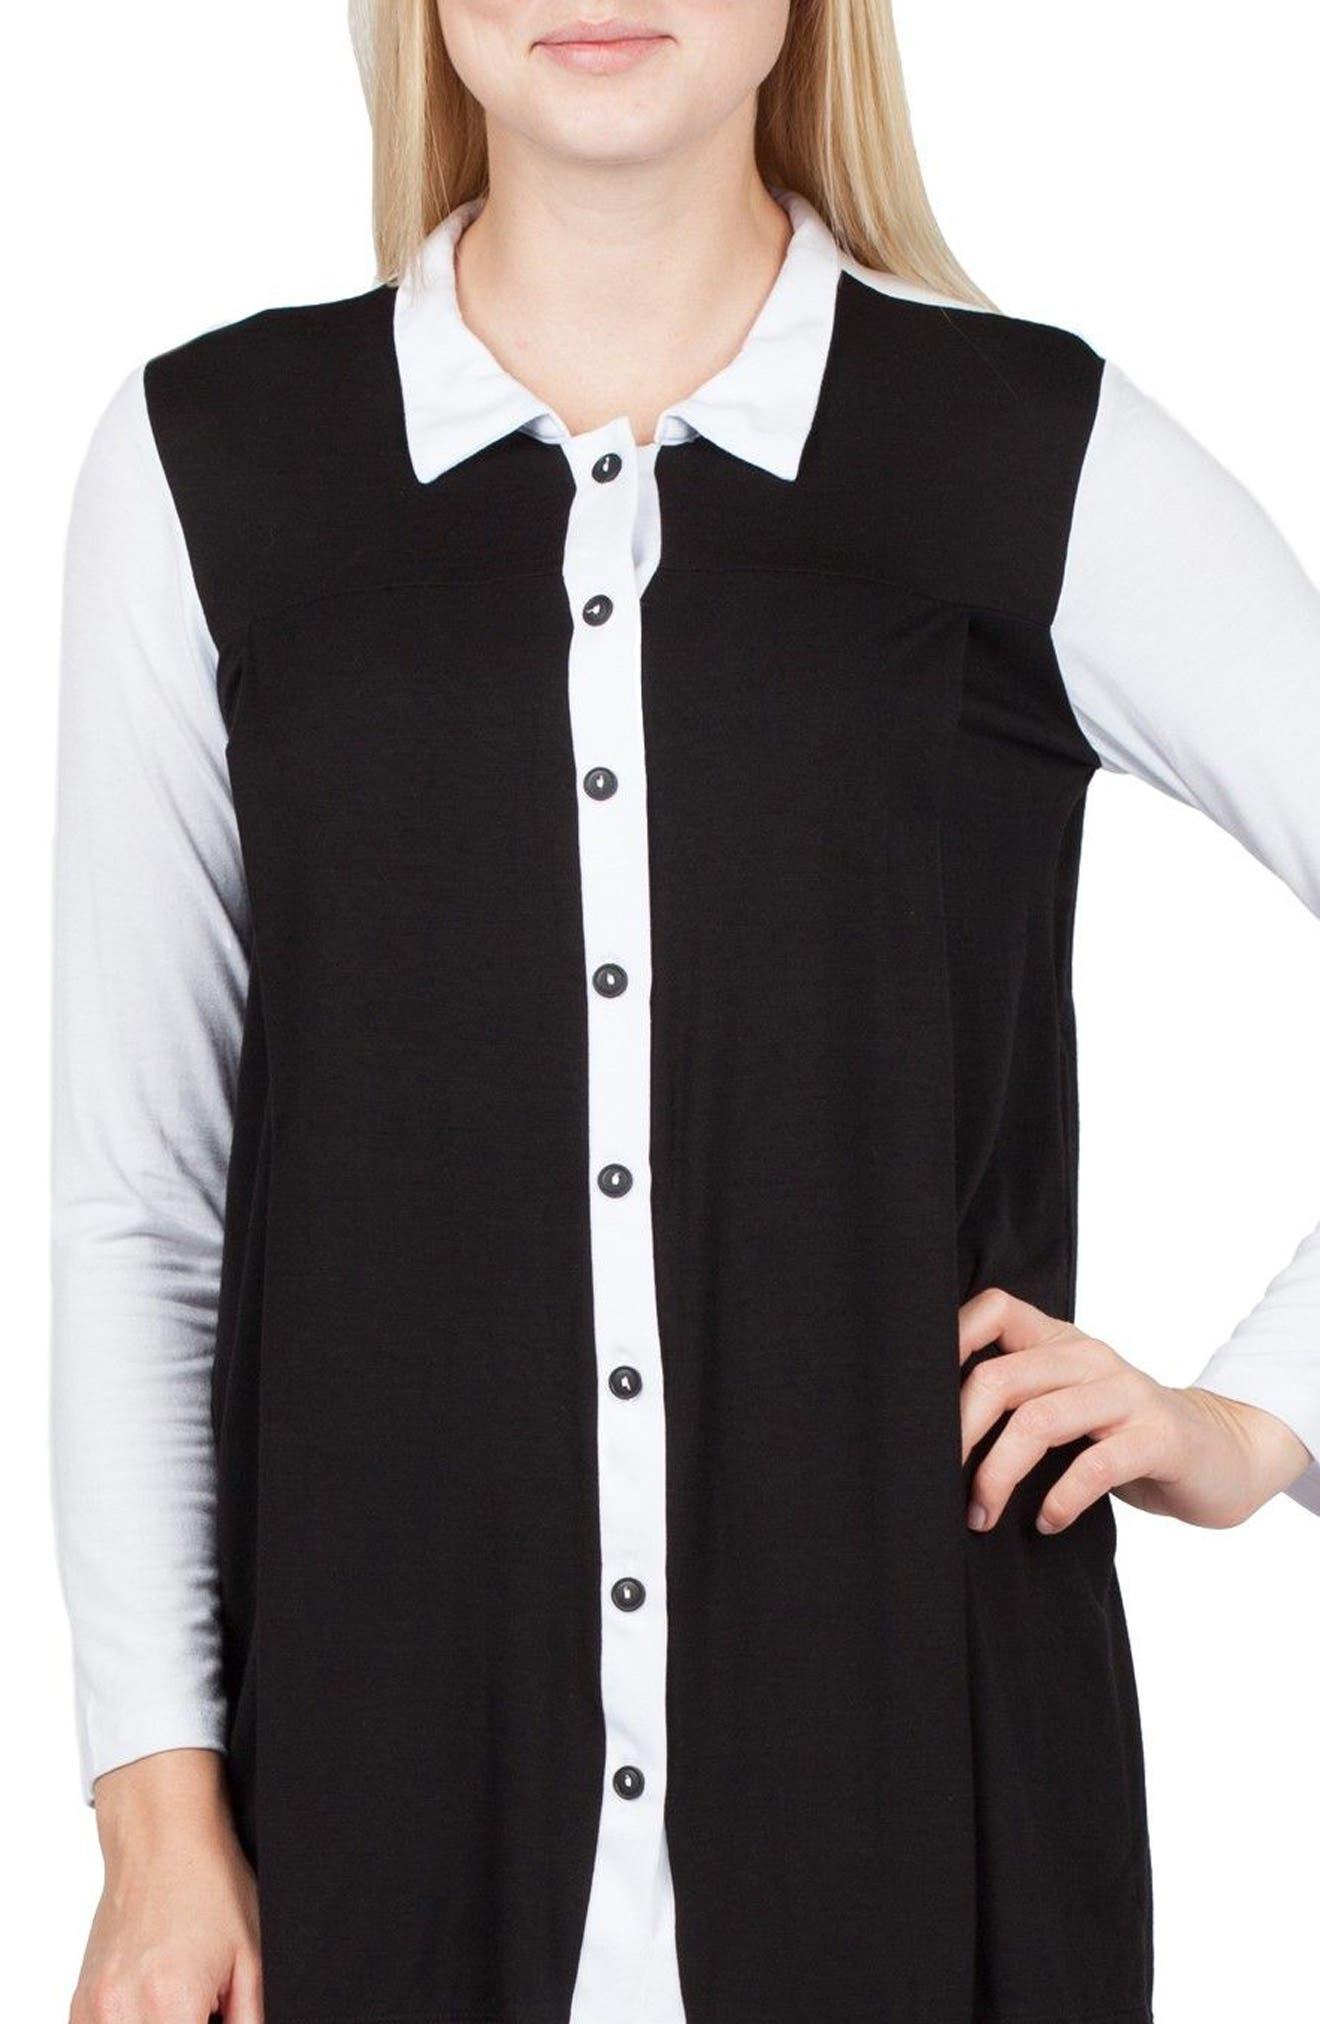 Berlin Colorblock Maternity/Nursing Tunic,                         Main,                         color, Black/ White Contrast